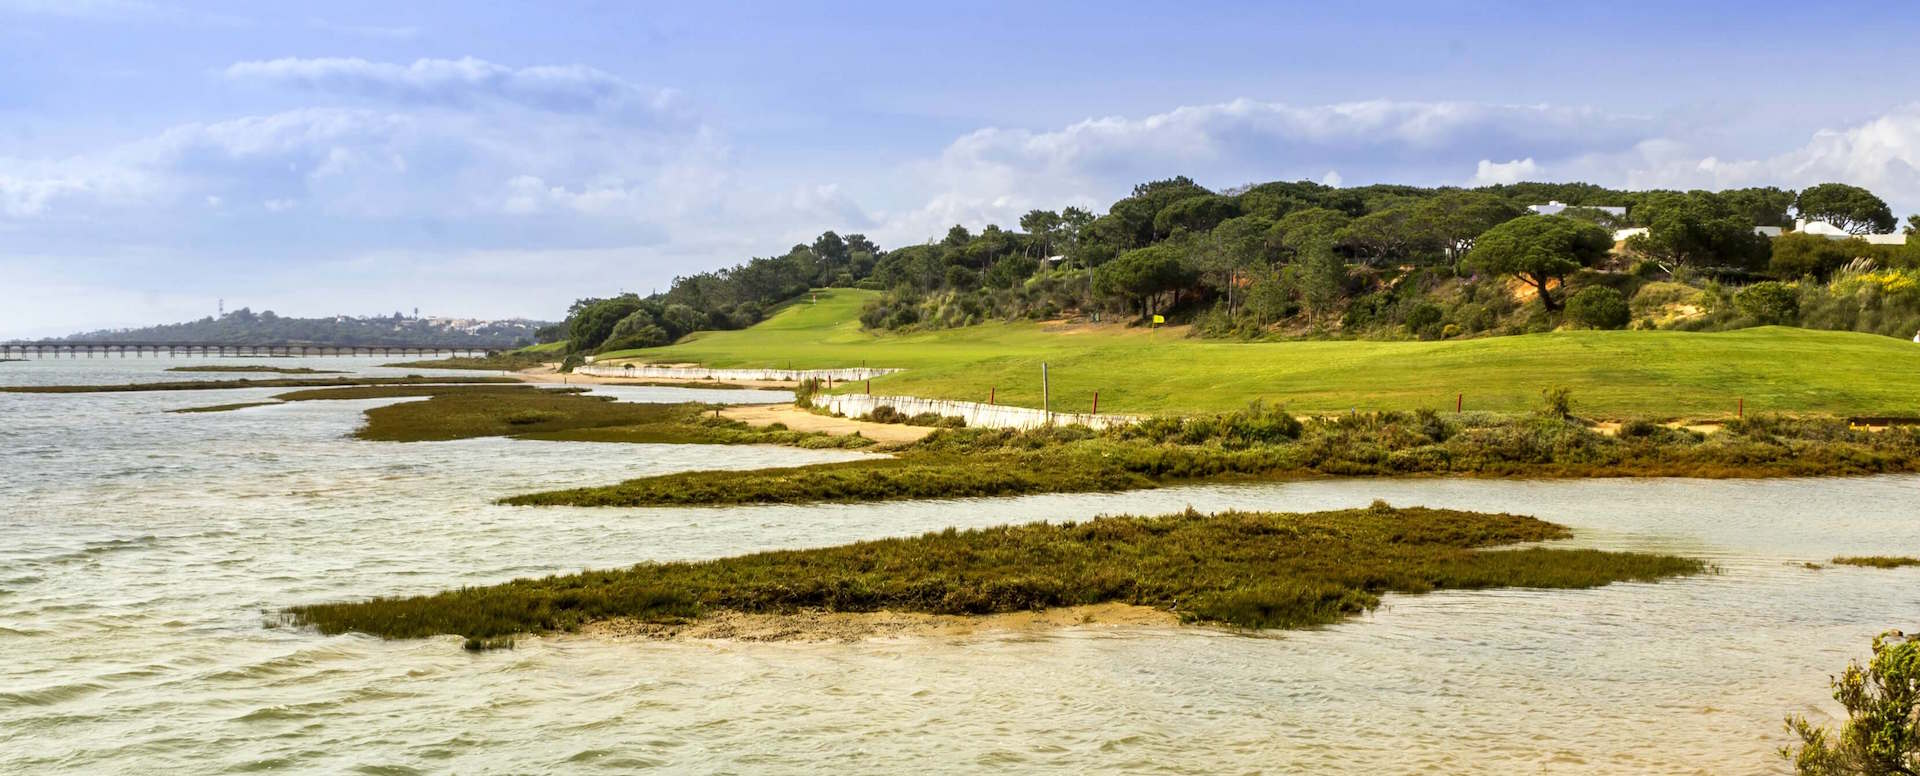 Le Parc Naturel de la Ria Formosa - Portugal